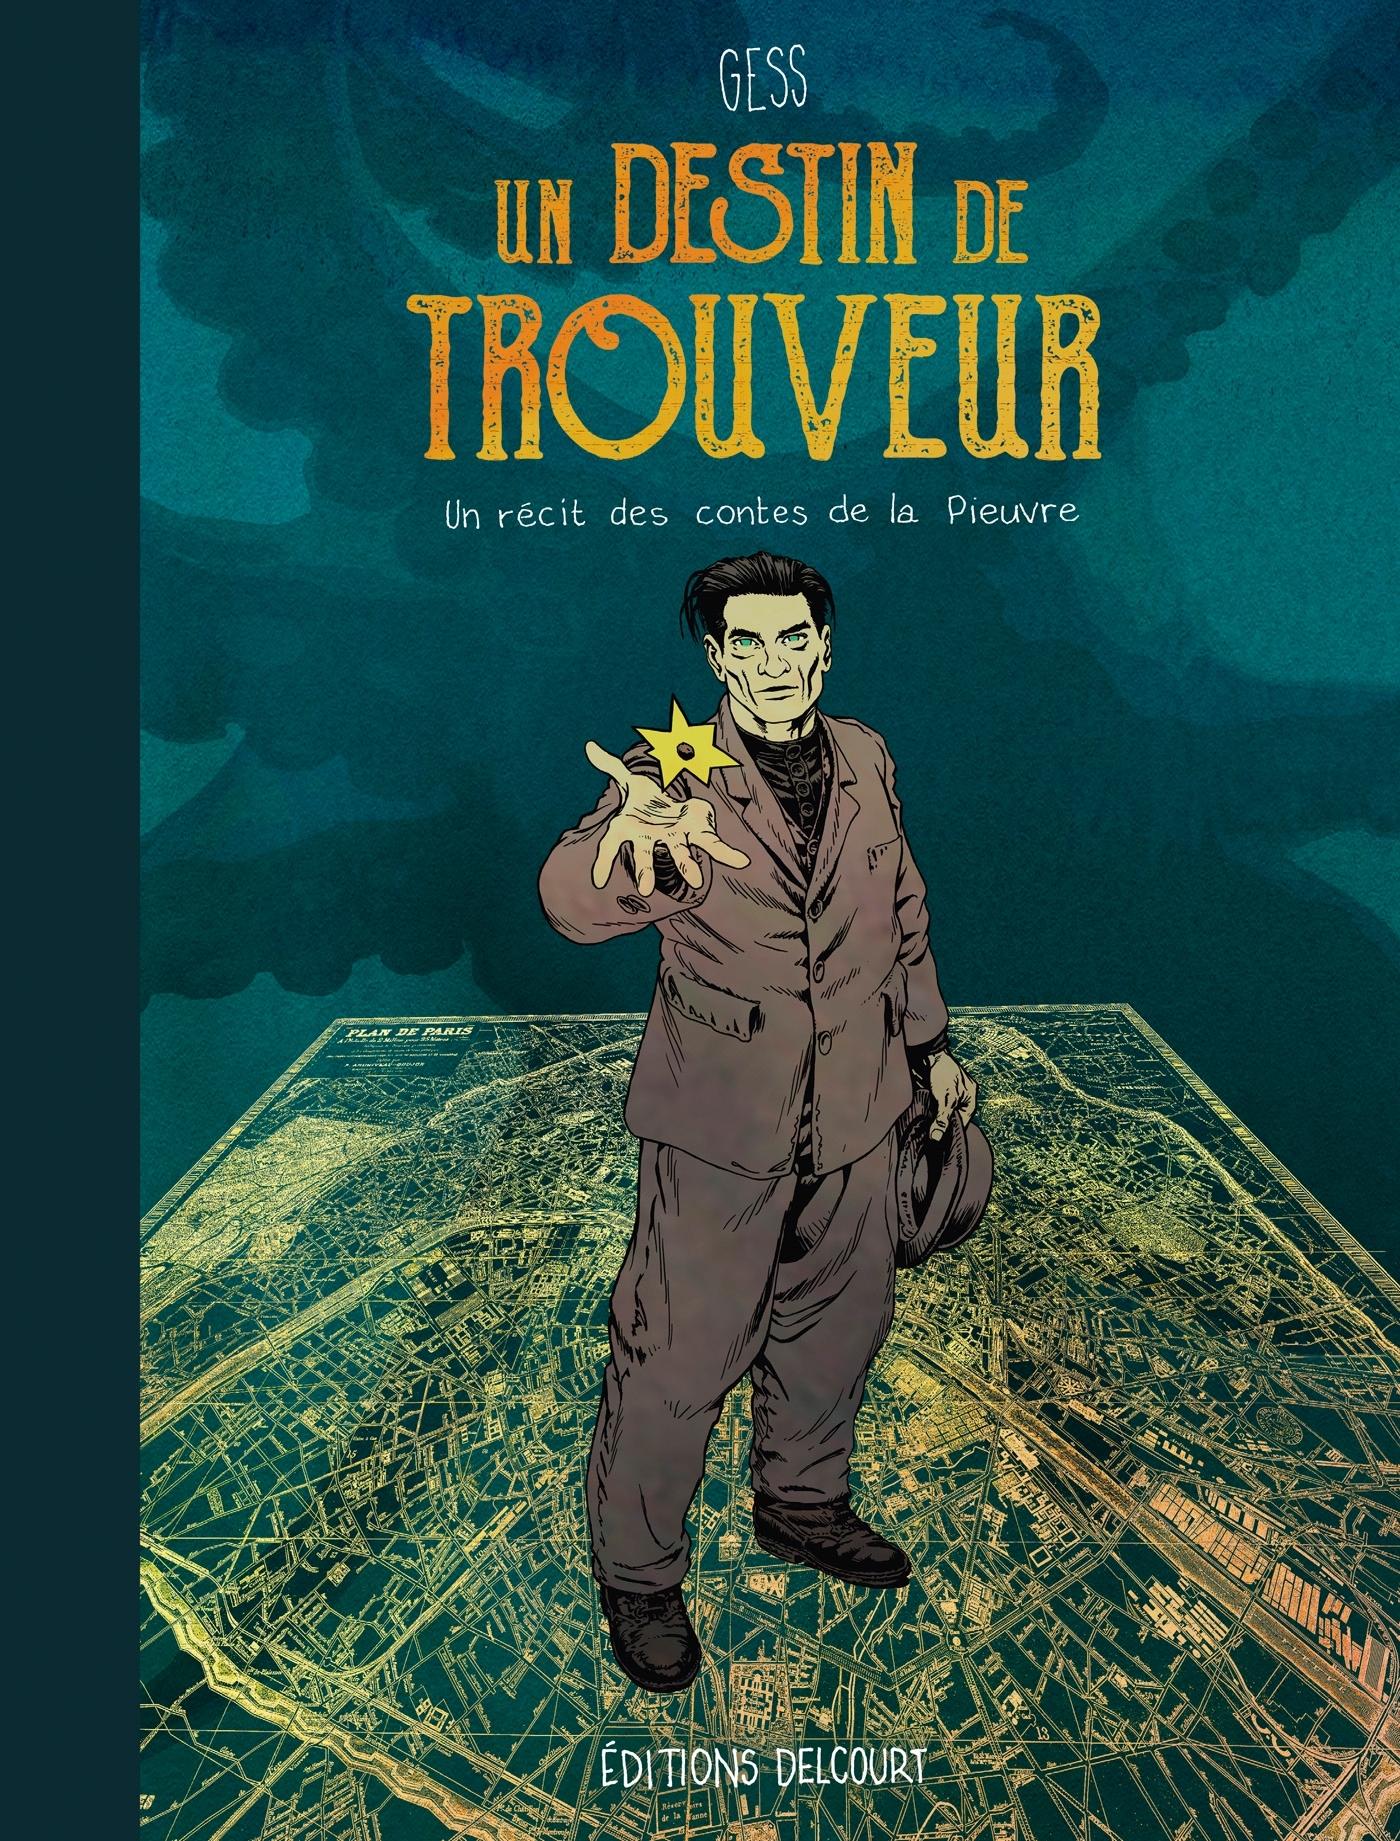 UN DESTIN DE TROUVEUR - T01 - UN DESTIN DE TROUVEUR